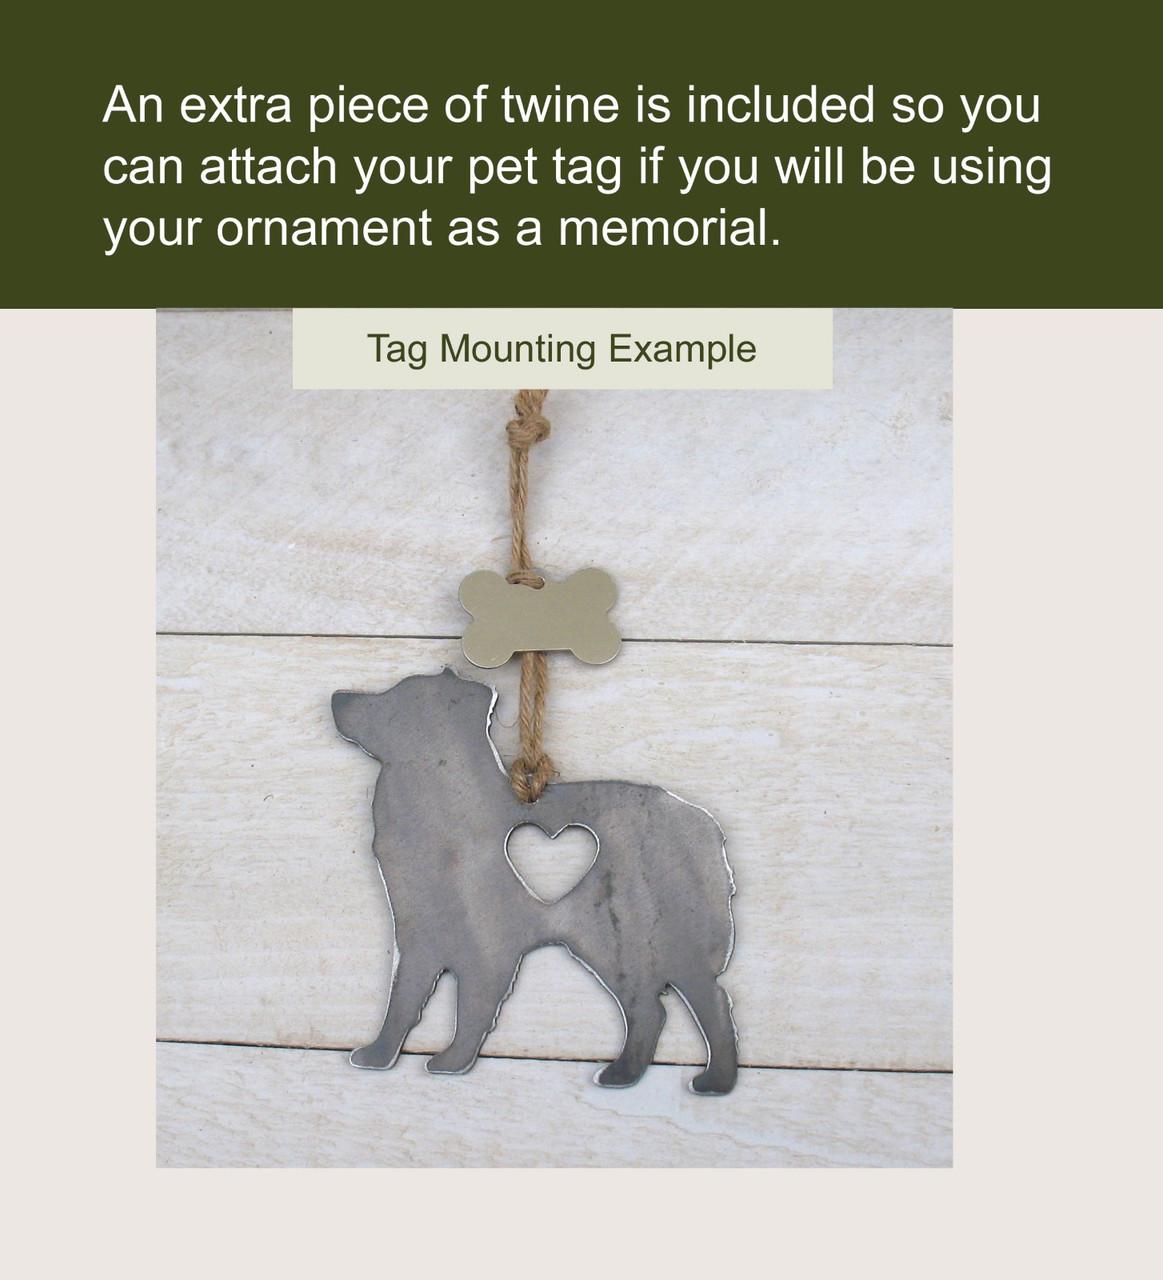 Shih Tzu 2 Pet Loss Gift Ornament Angel - Pet Memorial - Dog Sympathy Remembrance Gift - Metal Dog Christmas Ornament